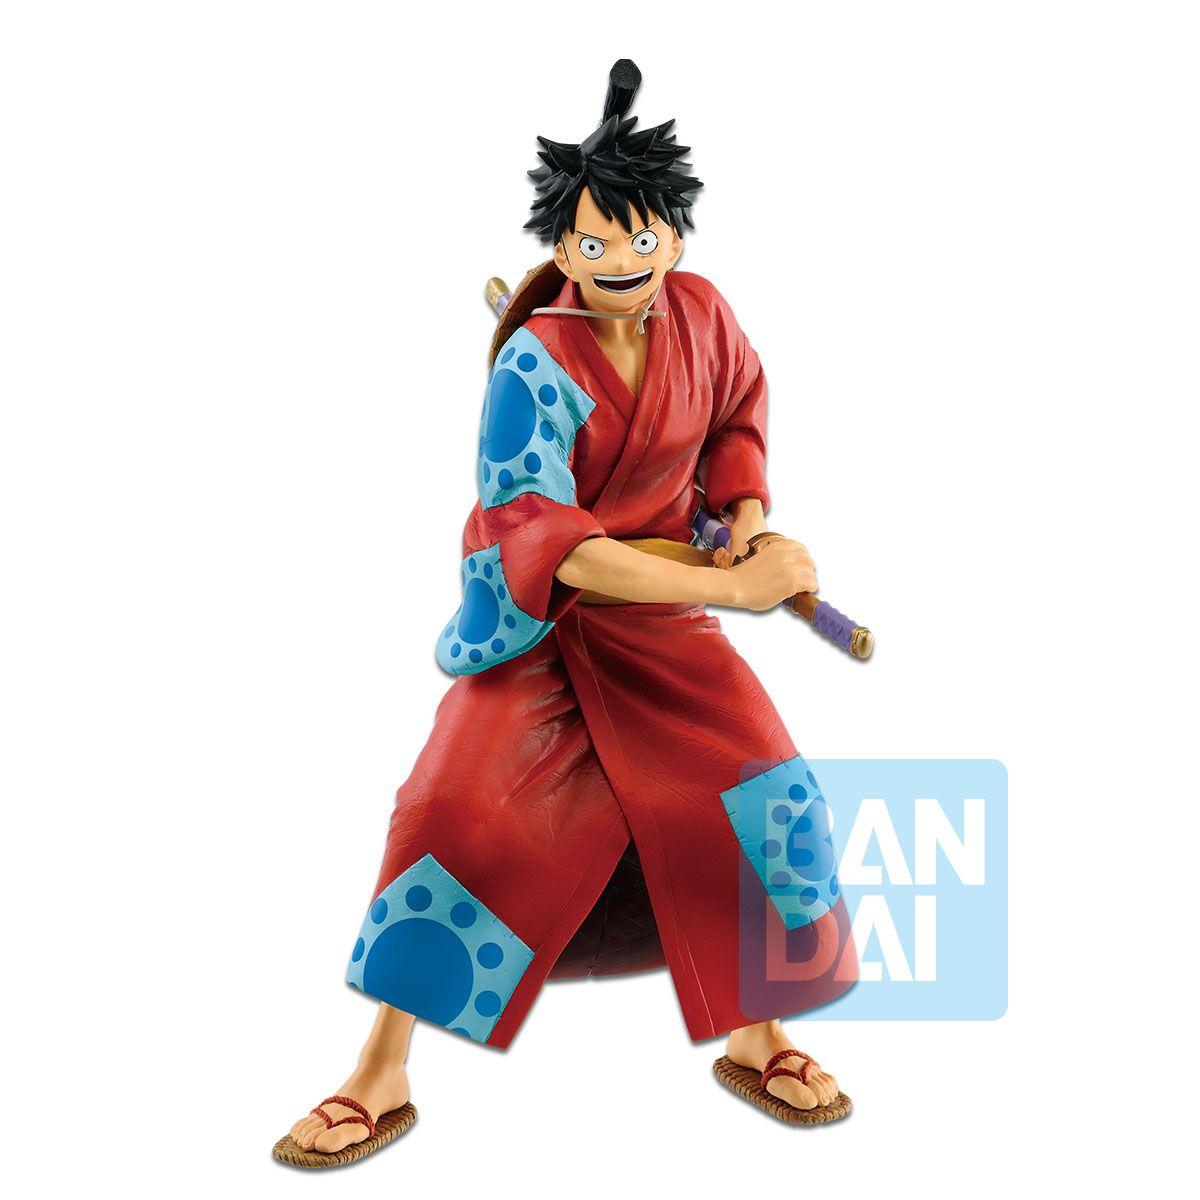 Stampede Nico Robin Character Ichiban Figure Statue Bandai Collection Anime Girls Art One Piece